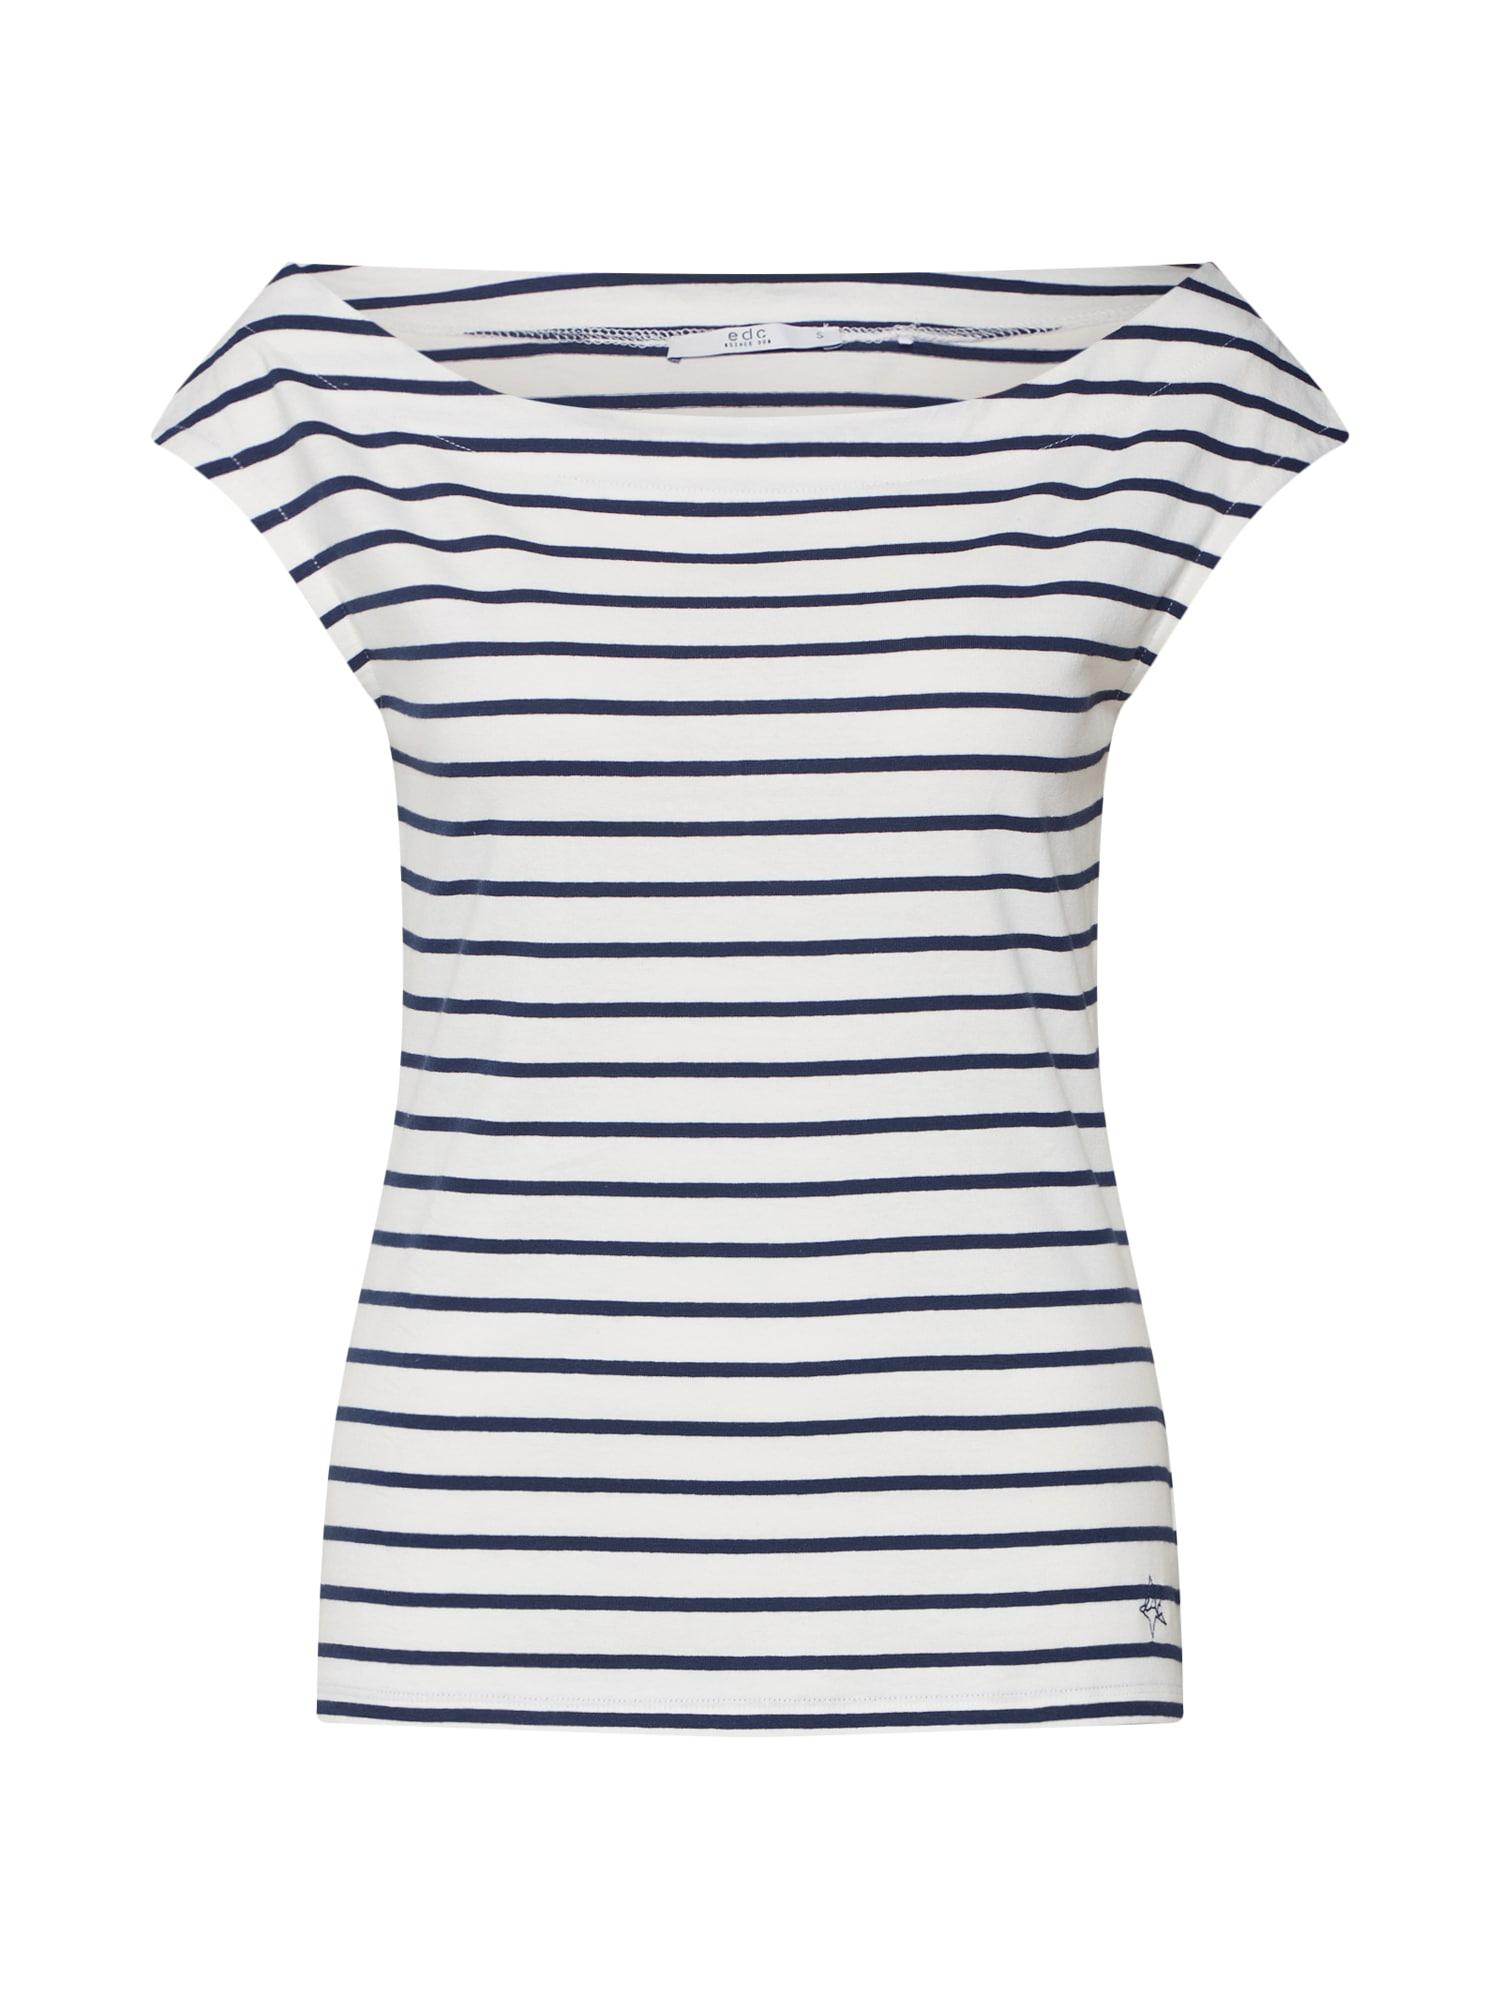 Tričko Co EL Carmen námořnická modř EDC BY ESPRIT